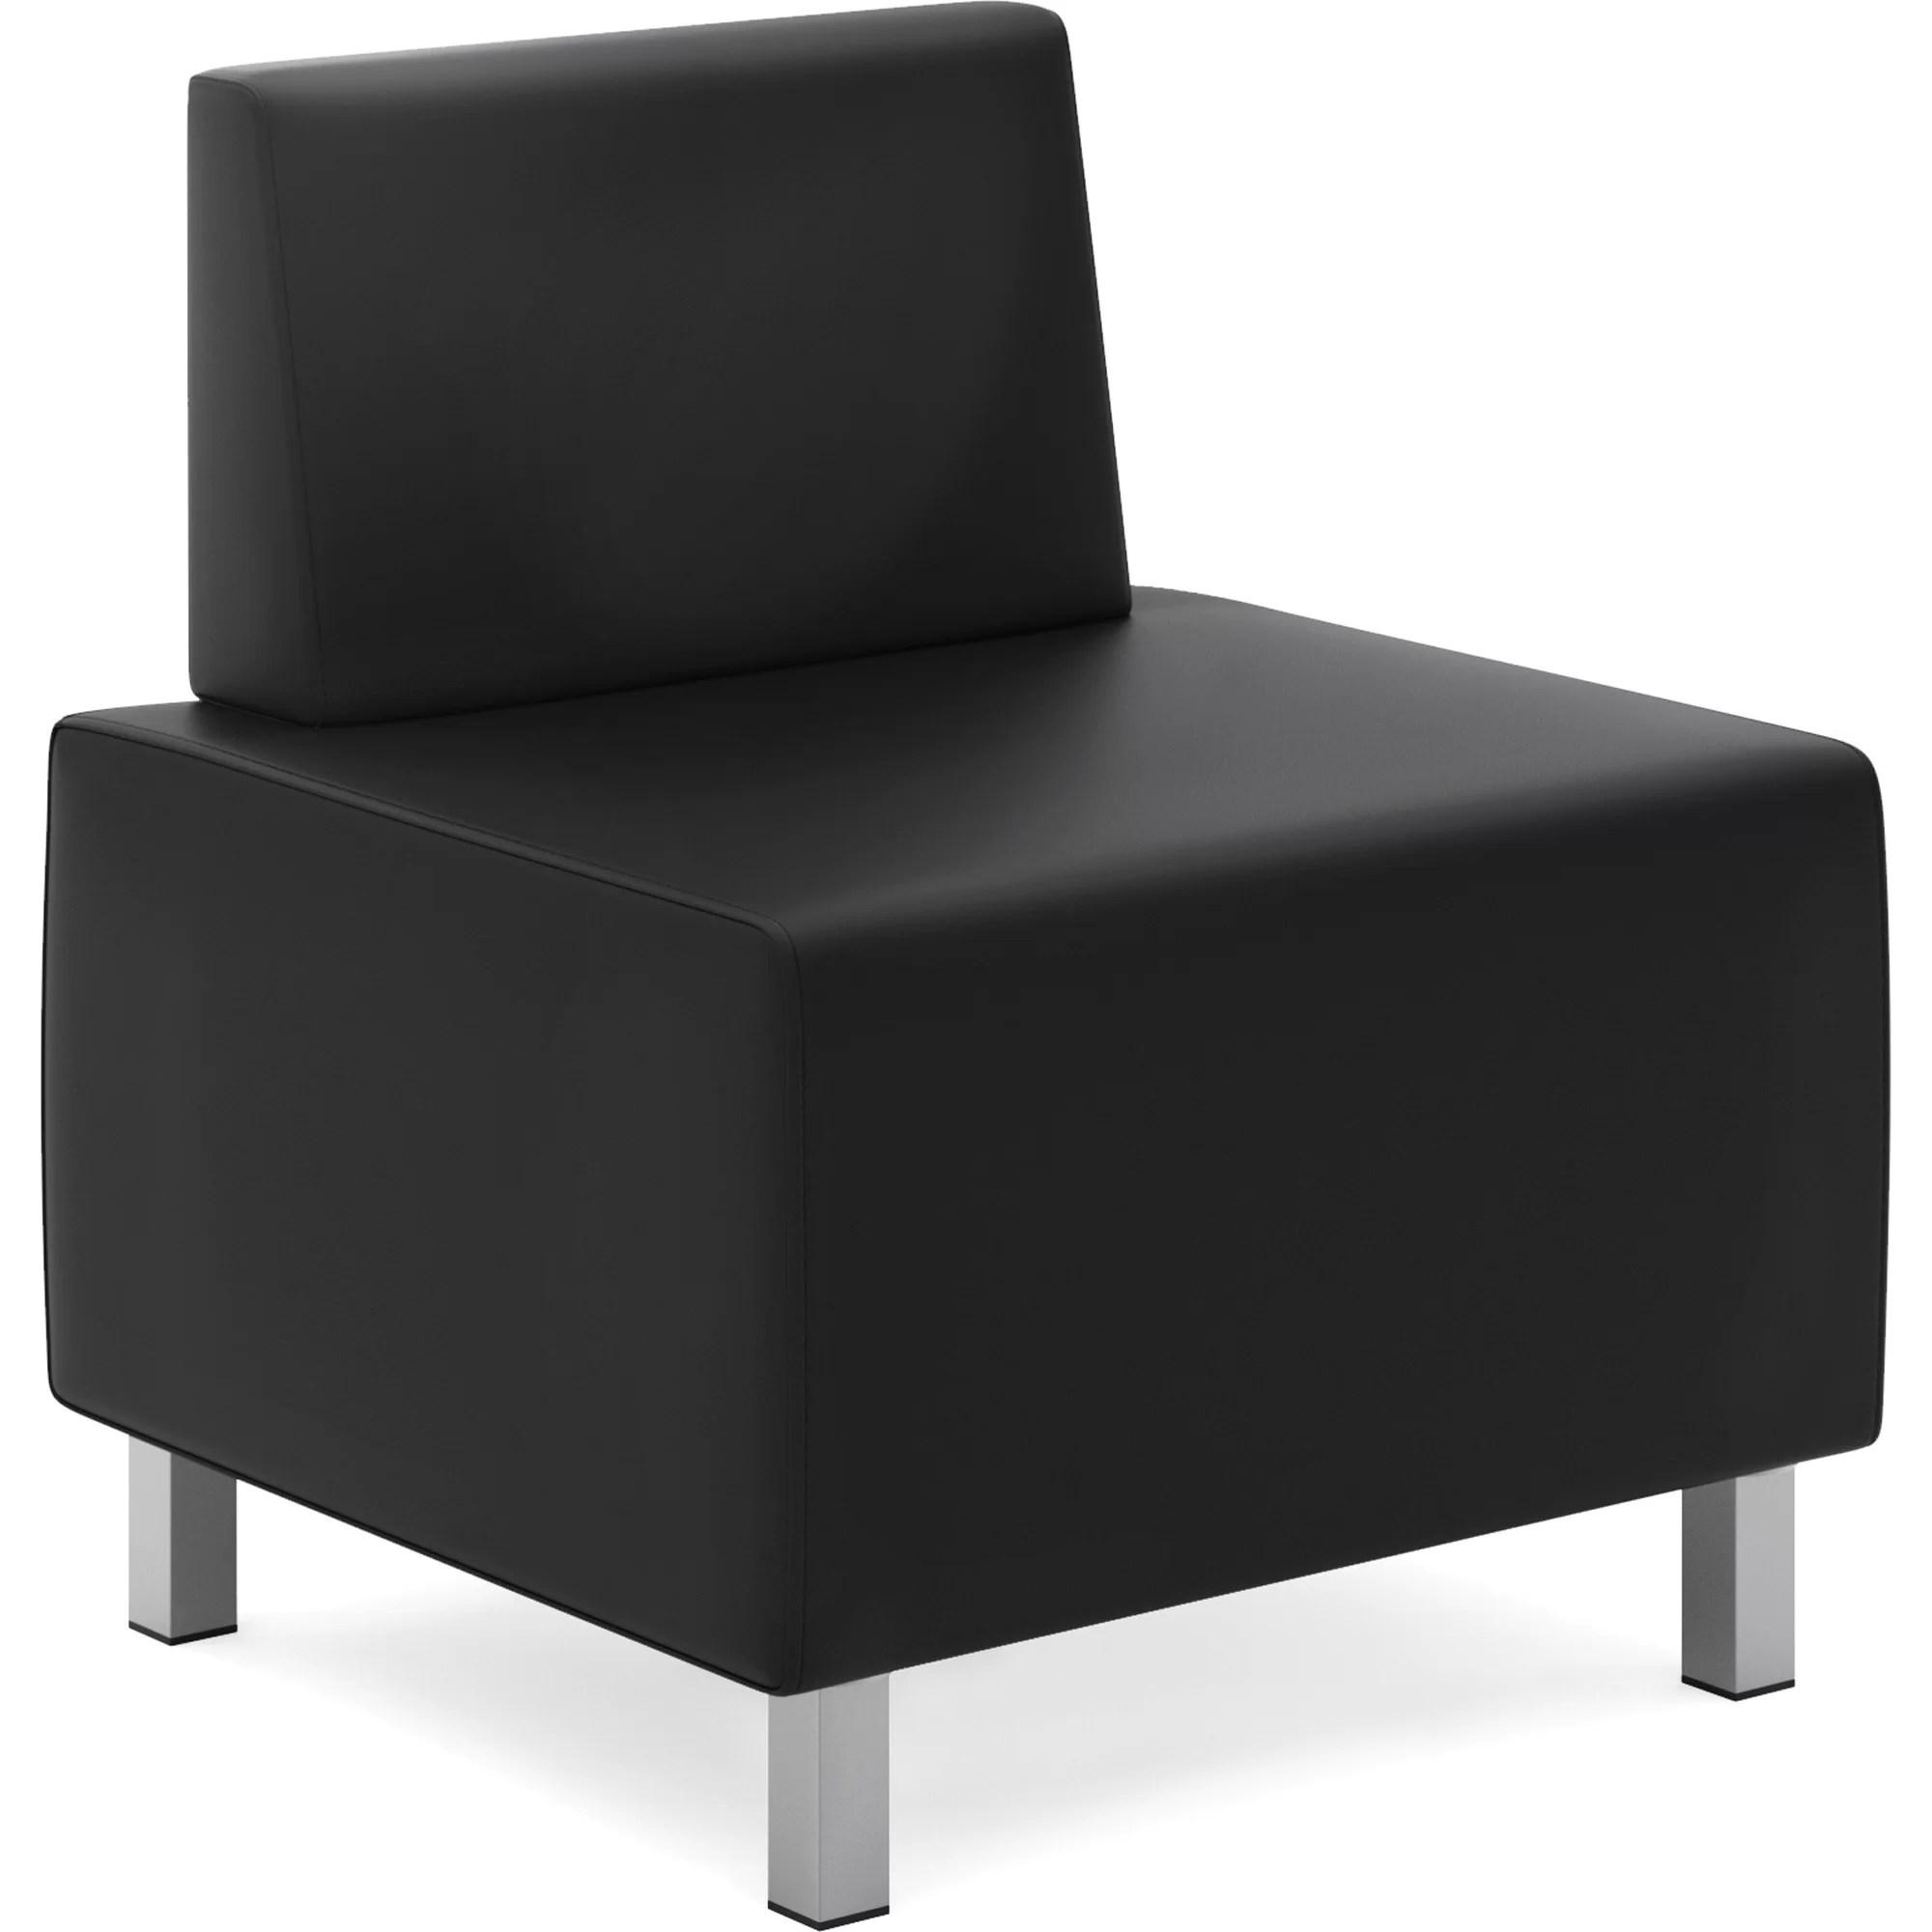 white leather slipper chair chicago bears folding basyx modular wayfair